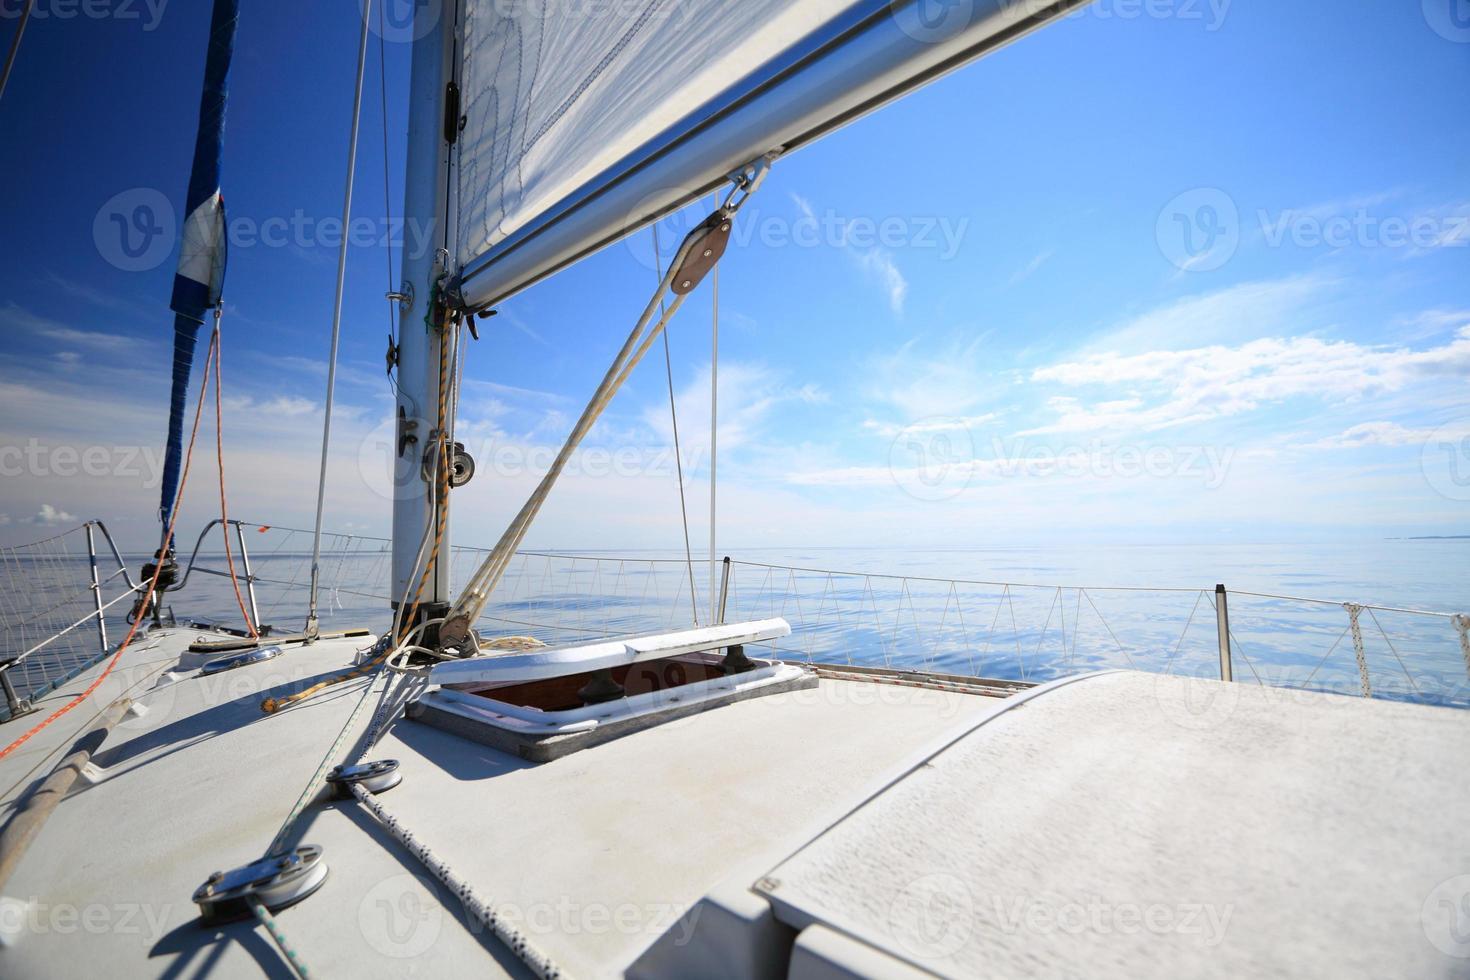 Sailboat yacht sailing in blue sea. Tourism photo